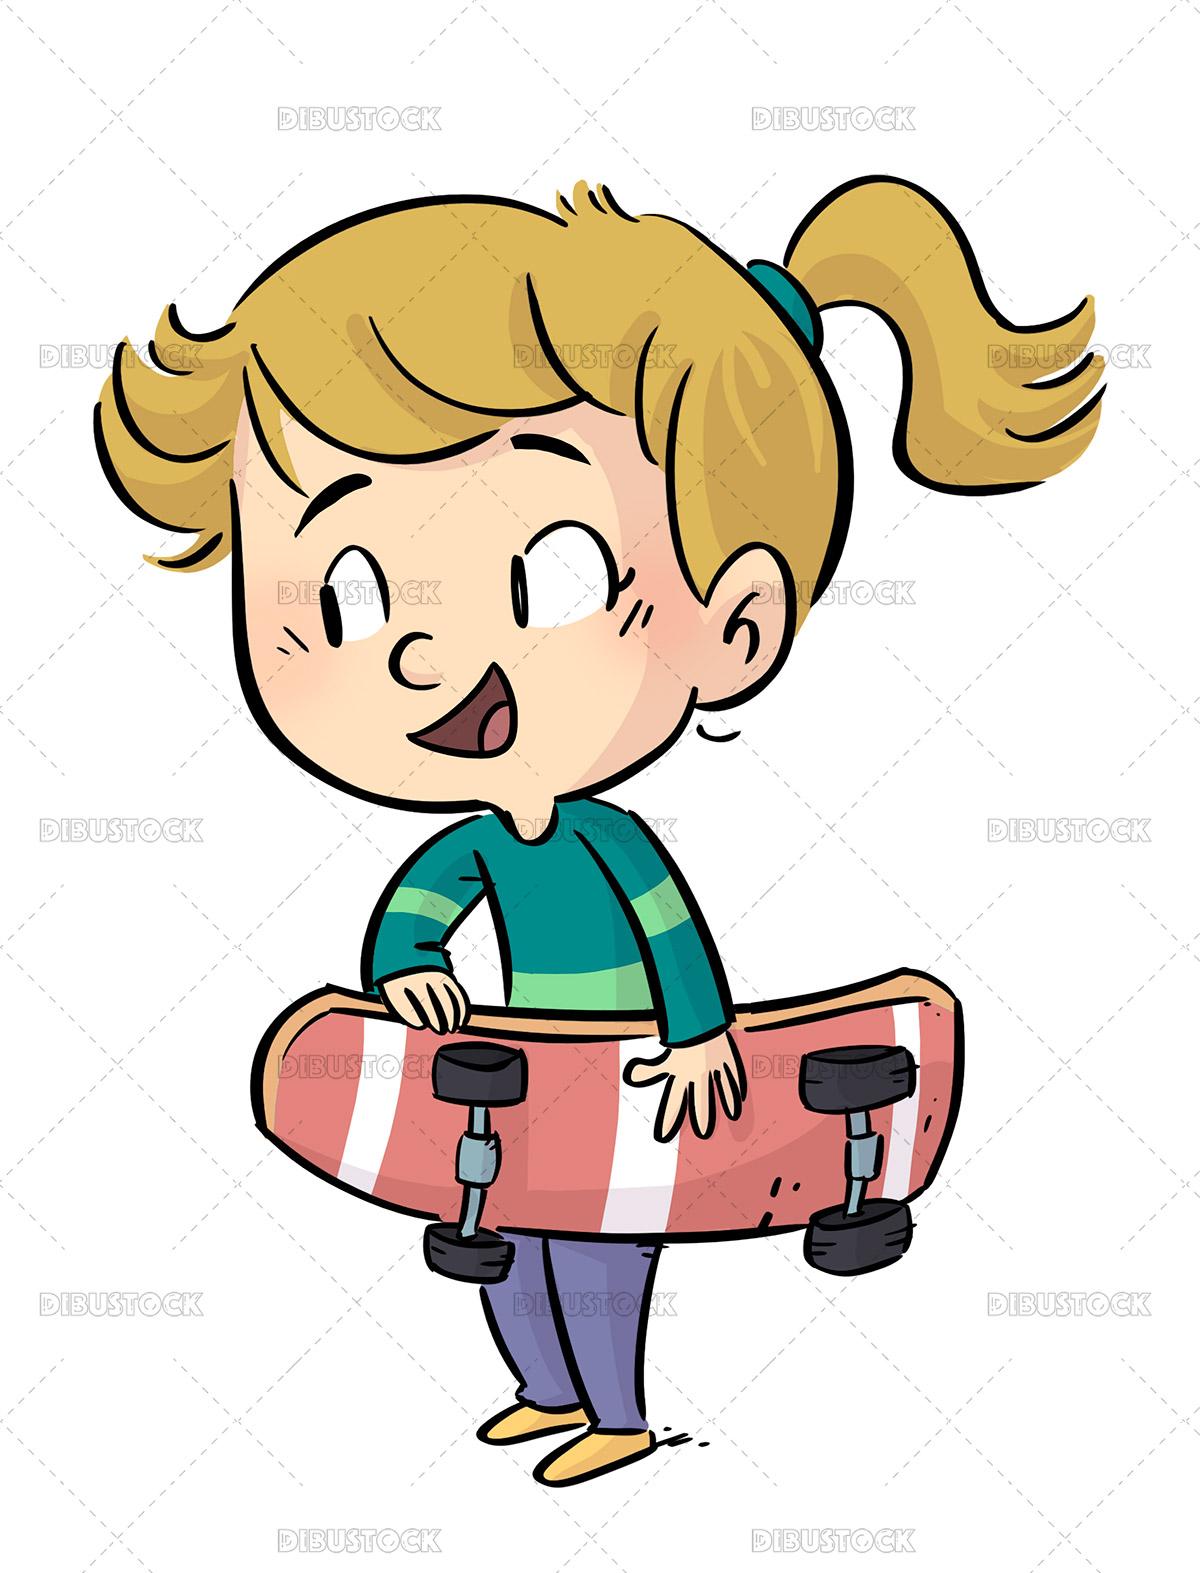 Illustration of little girl with skateboard in hand